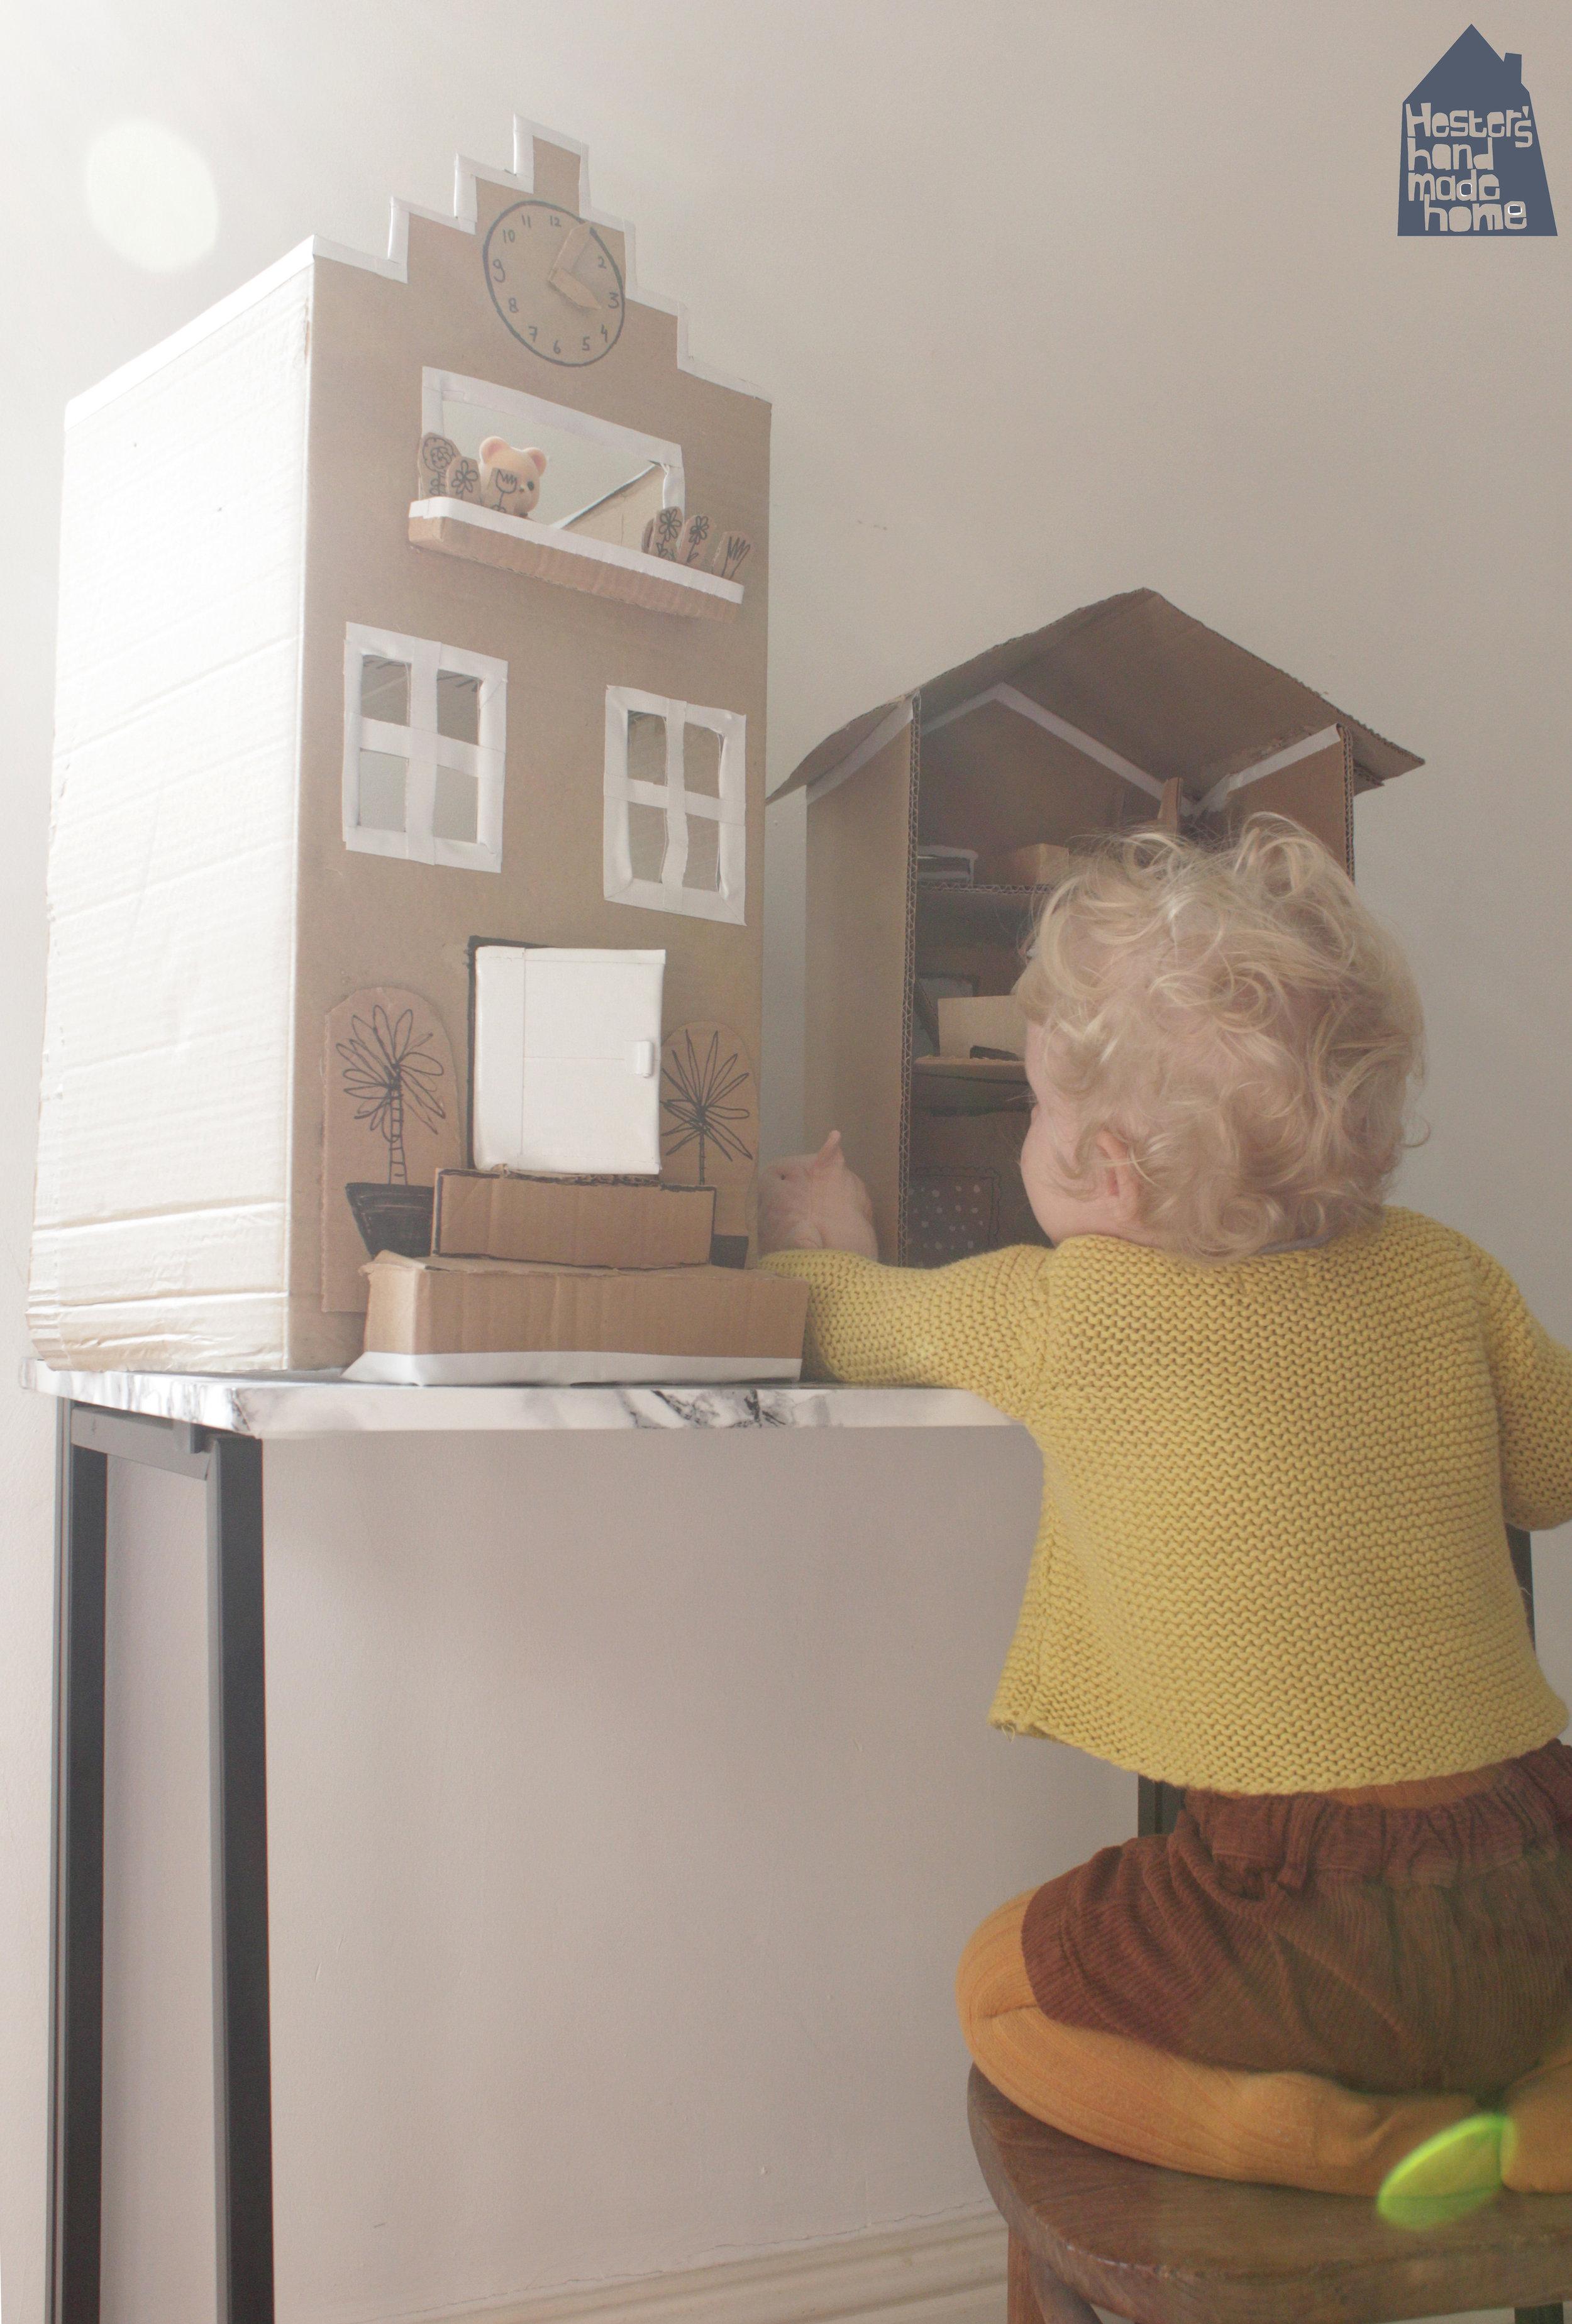 Cardboard dolls house by Hester's Handmade Home